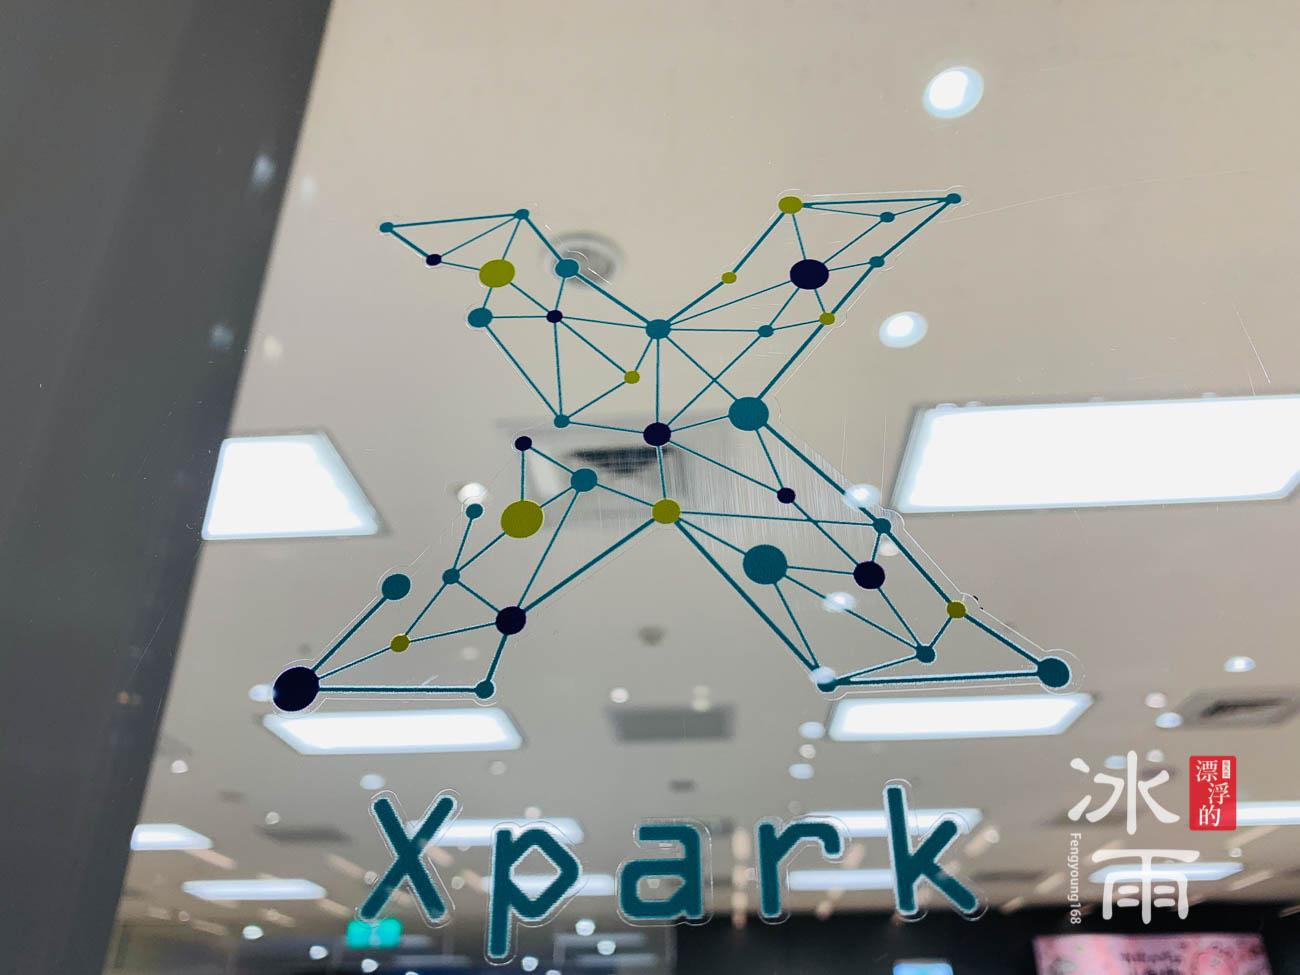 X fun|Xpark水族館LOGO設計,在禮品店玻璃上的貼紙